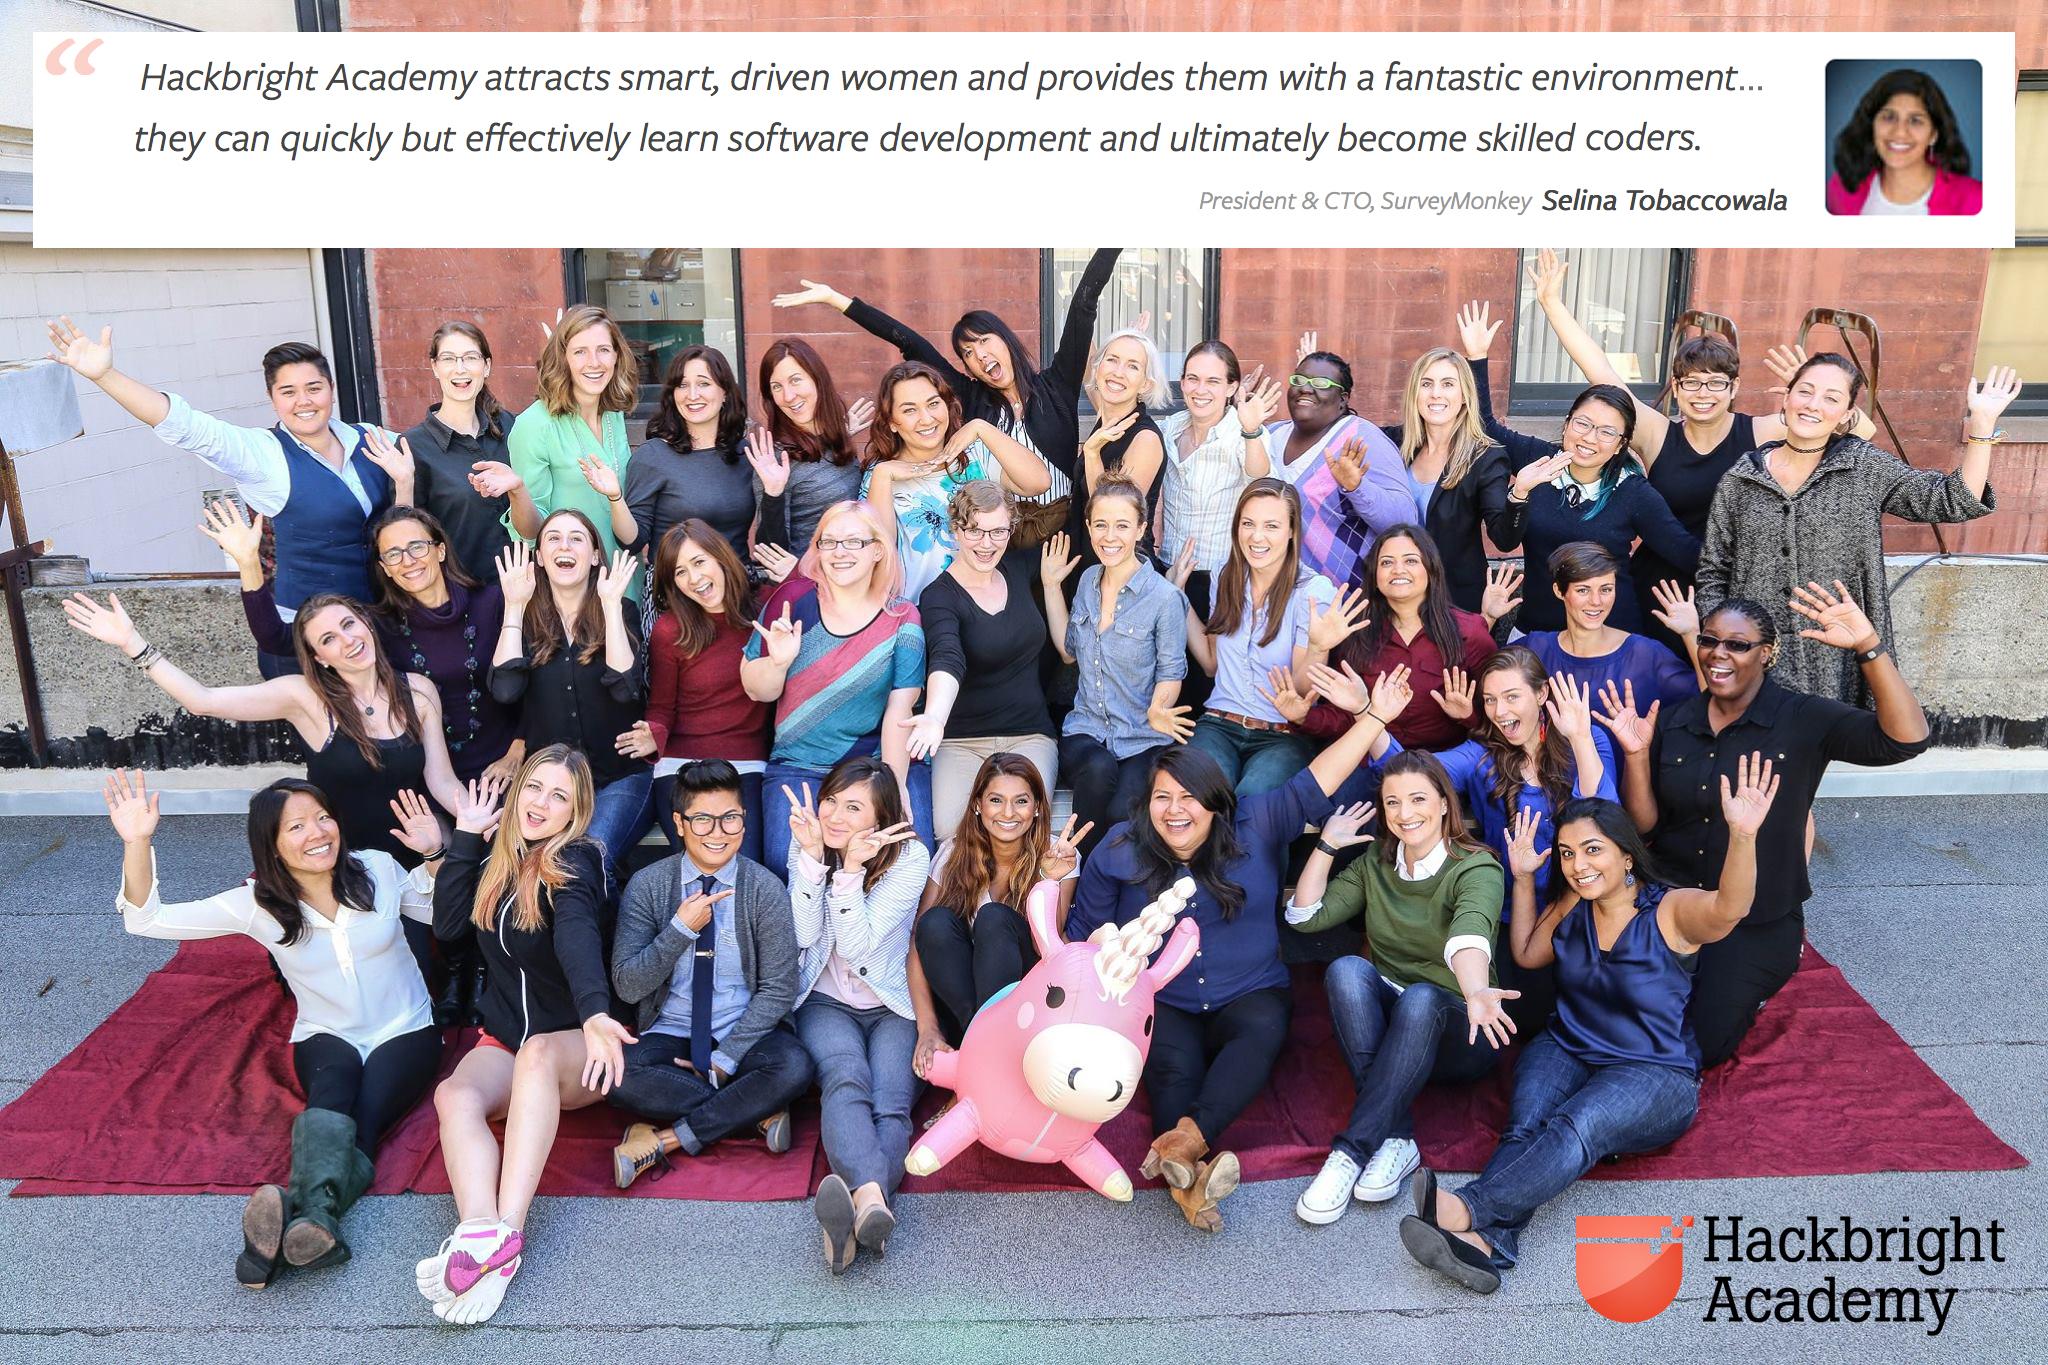 Hackbright Academy - Fall 2015 Career Day is December 1, 2015 - meet 34 female software engineers!